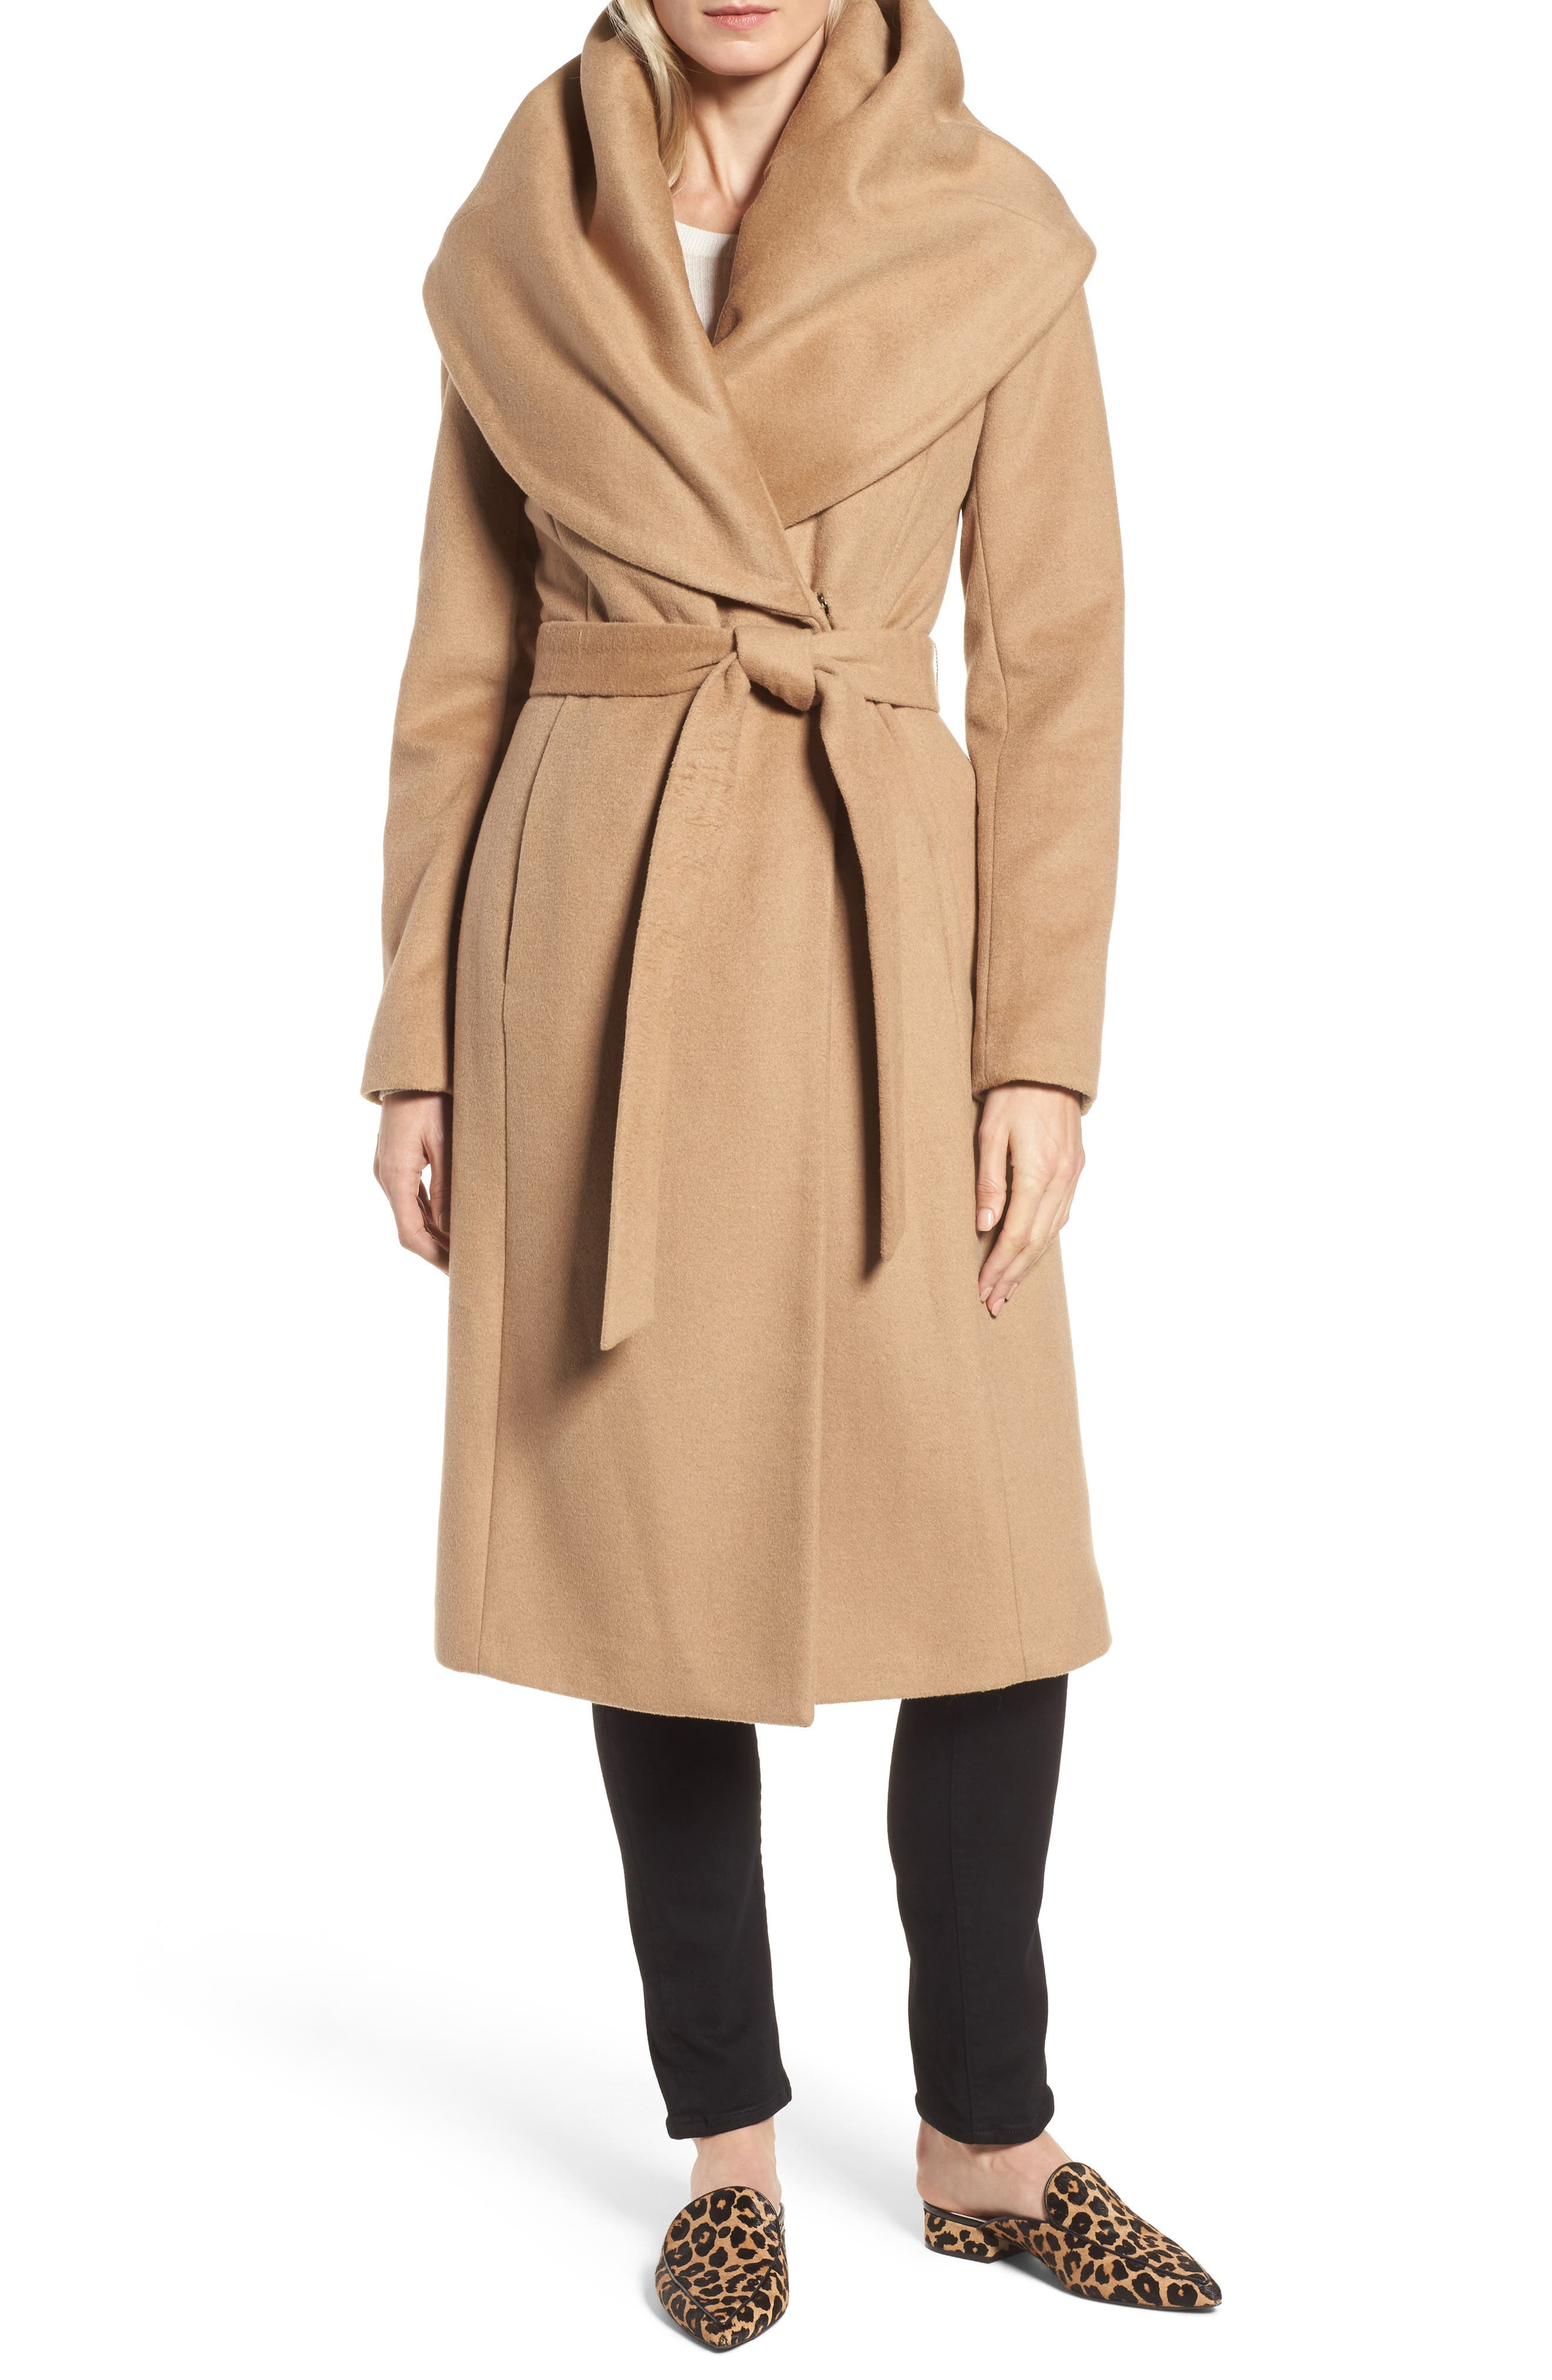 DKNY Wool Blend Shawl Collar Wrap Coat,                         Main,                         color, 252